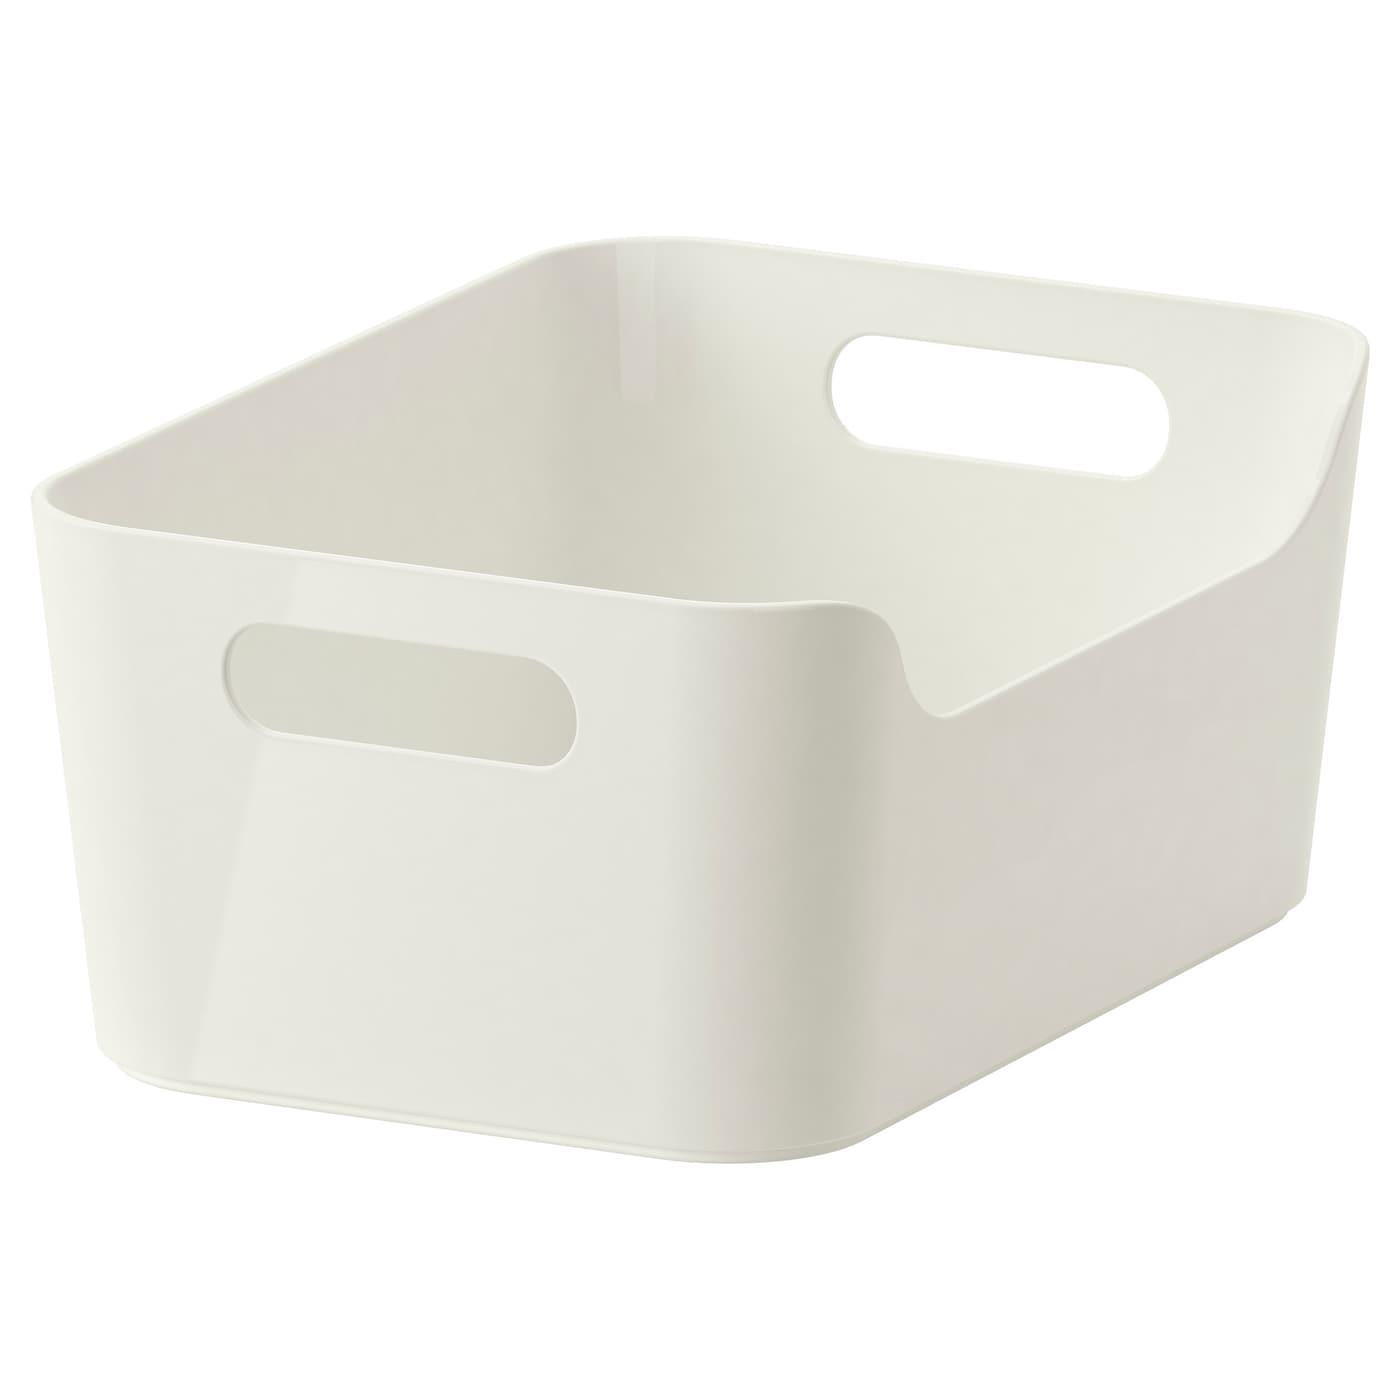 cajas de plastico para almacenar ikea